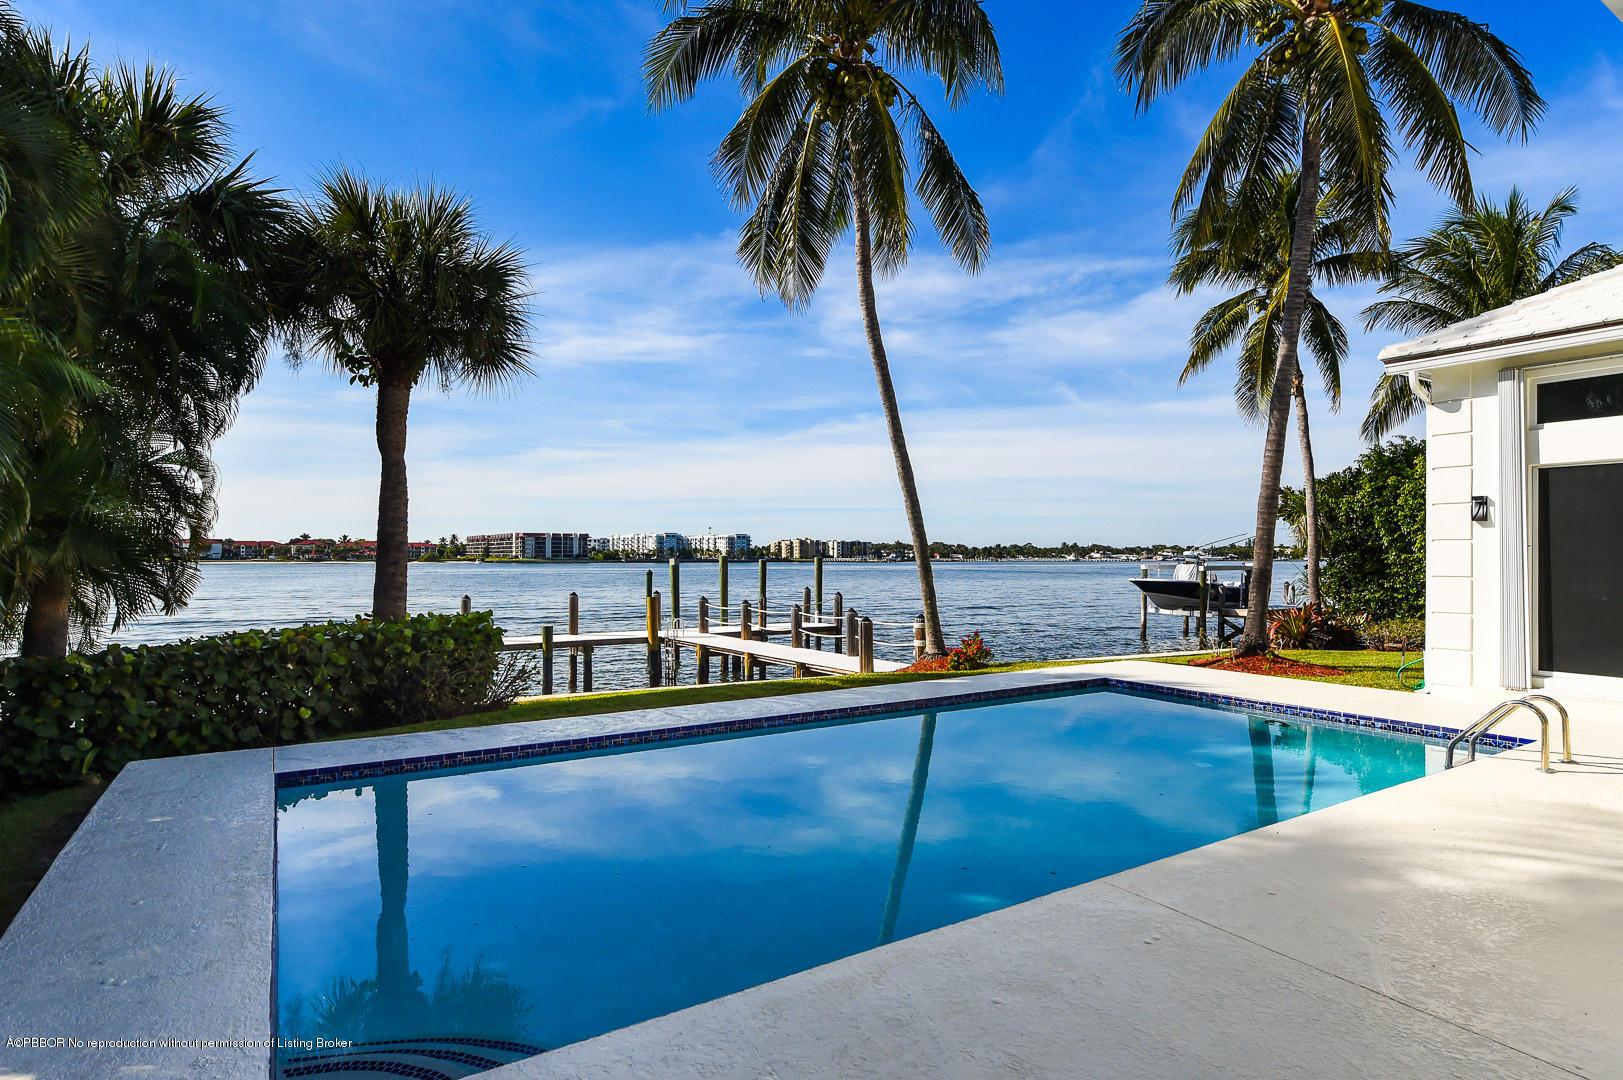 1235 Lands End Road - Lantana, Florida